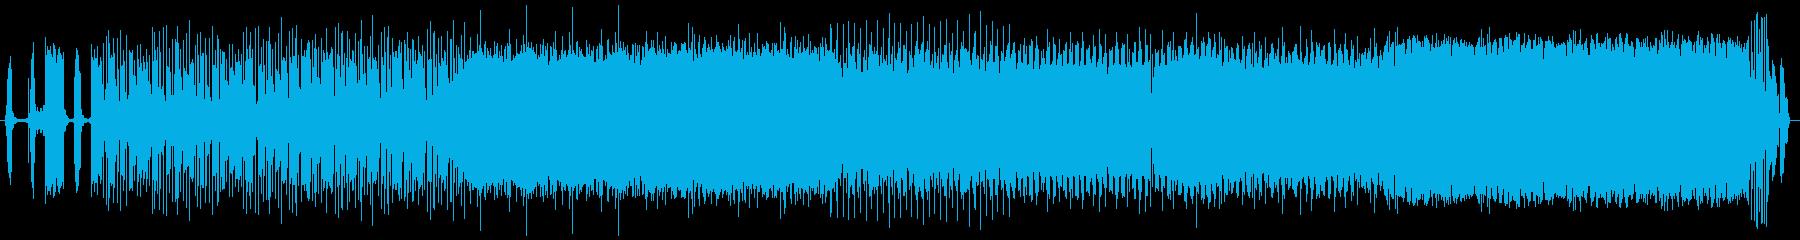 SFサスペンス・ドラマBGMの再生済みの波形